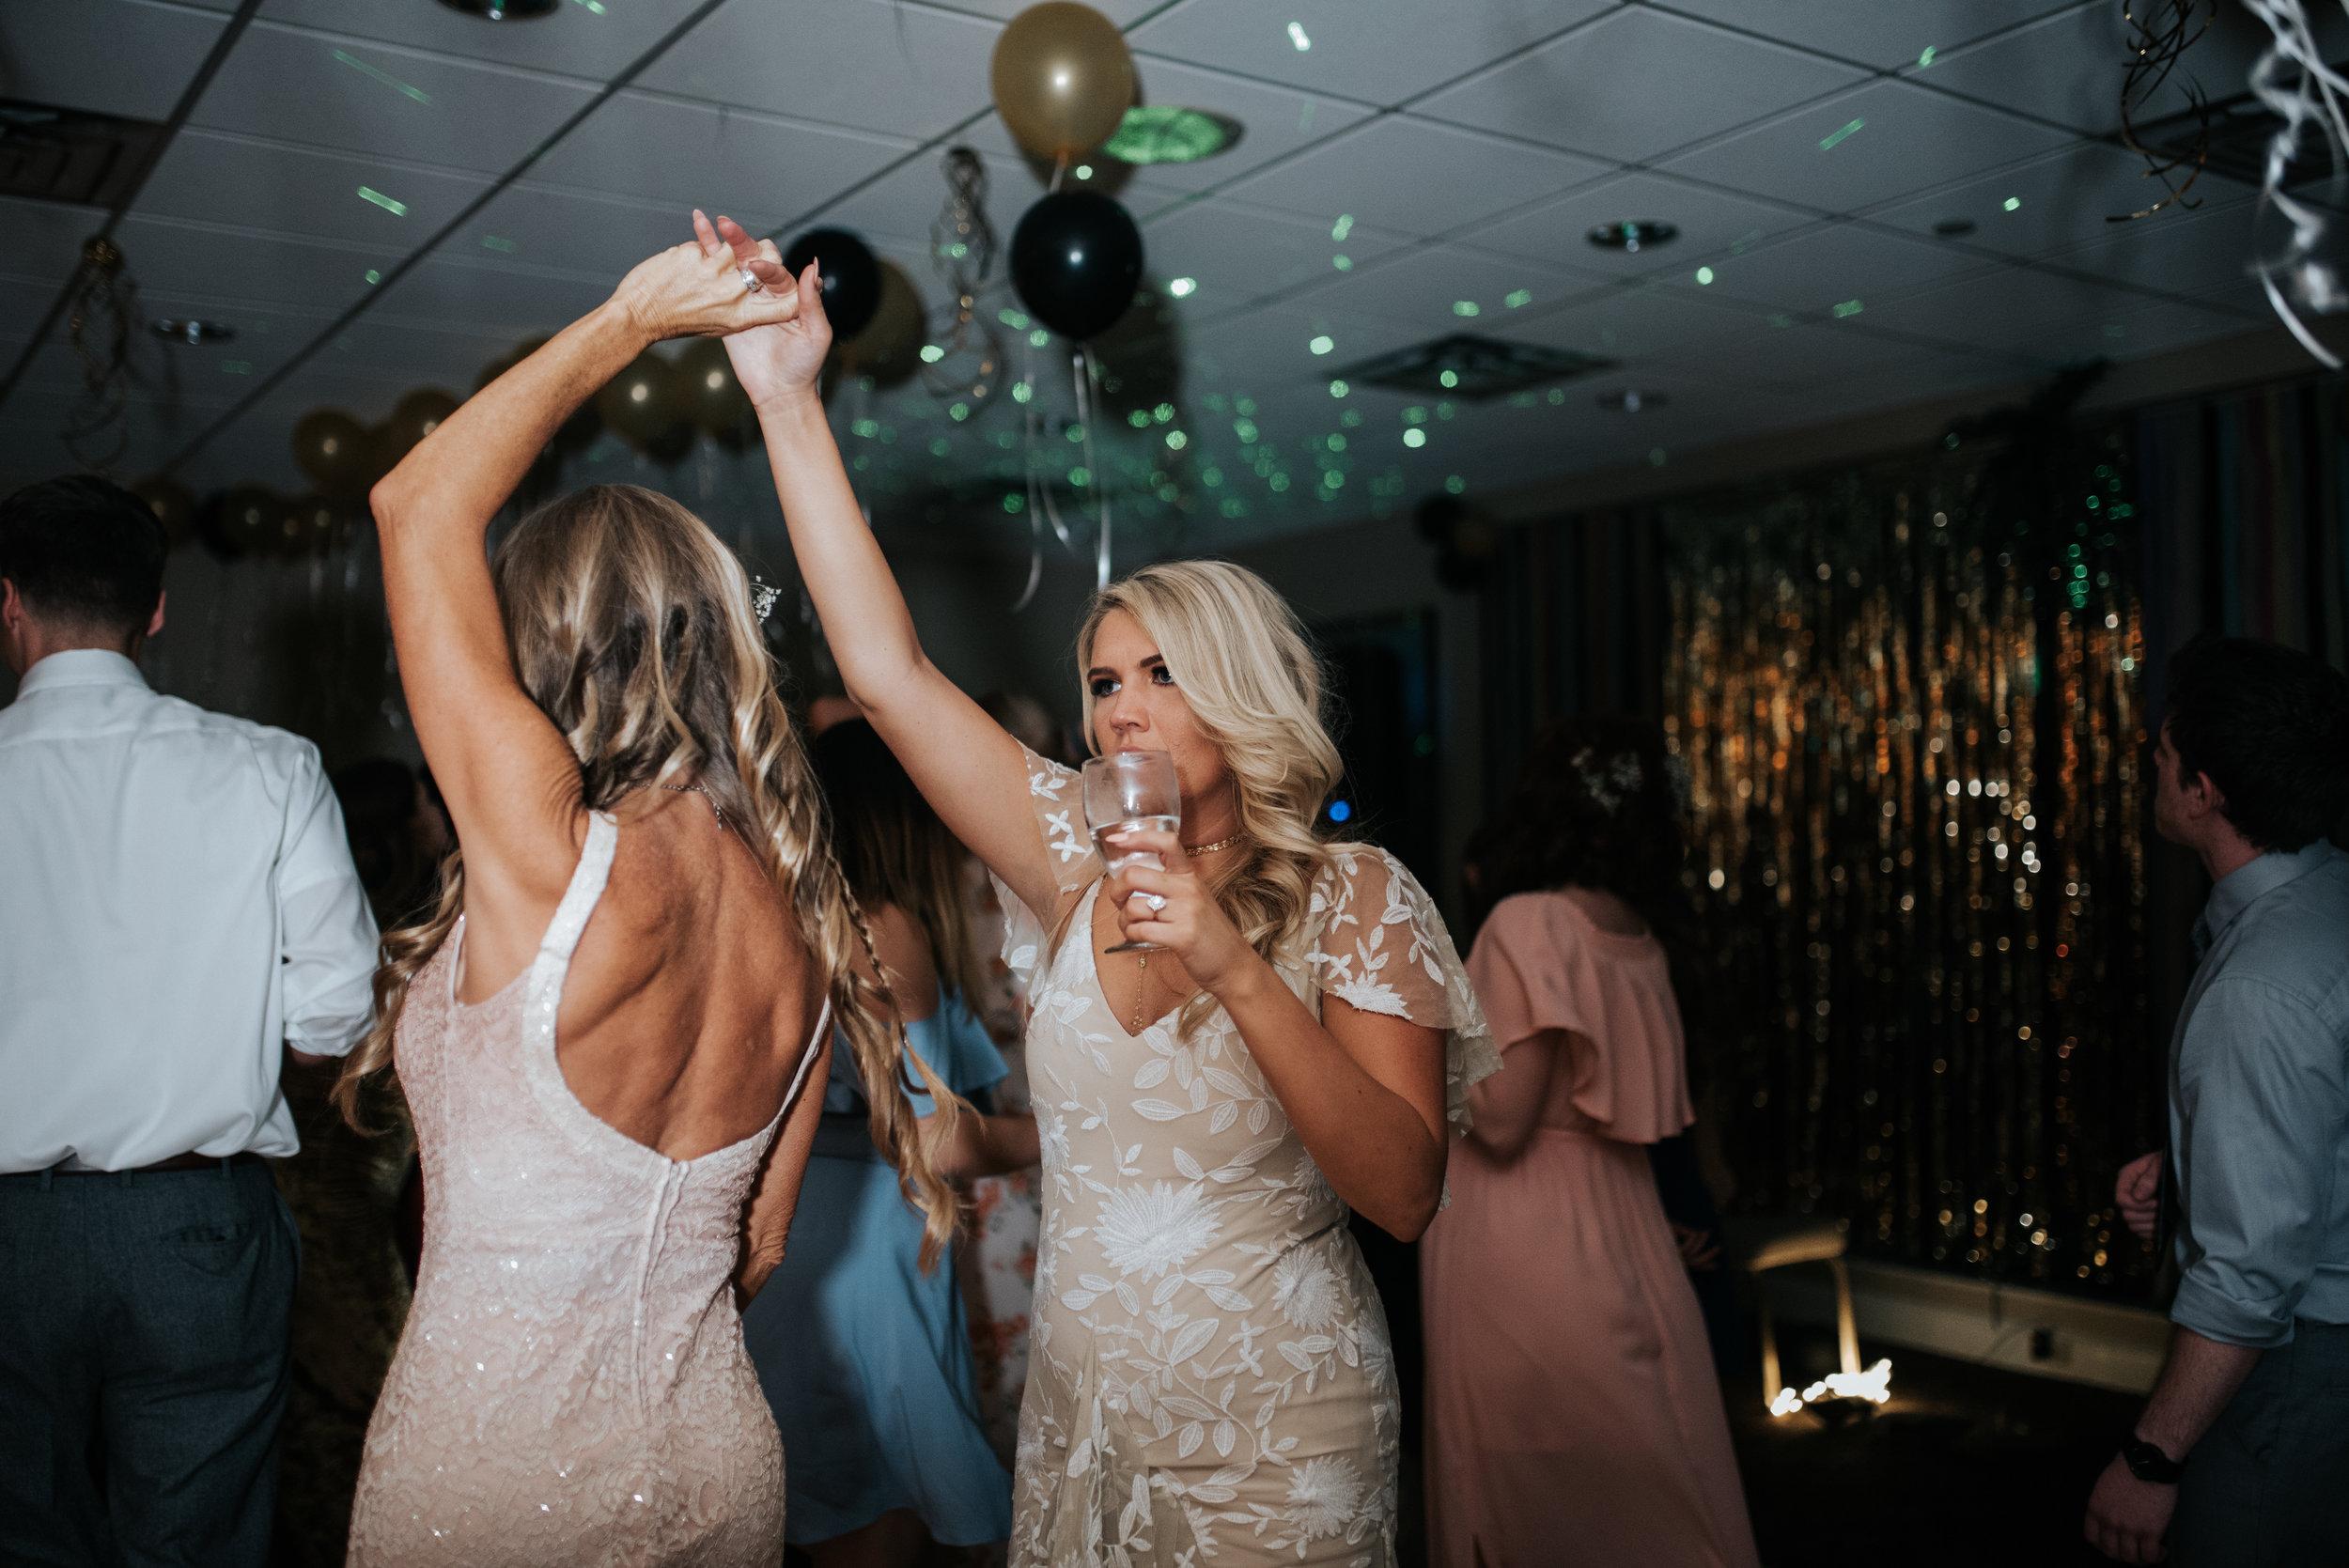 zayda-collin-panama-city-wedding-photography-trippy-bohemian-lisa-frank-wedding-dancing-party-103.jpg